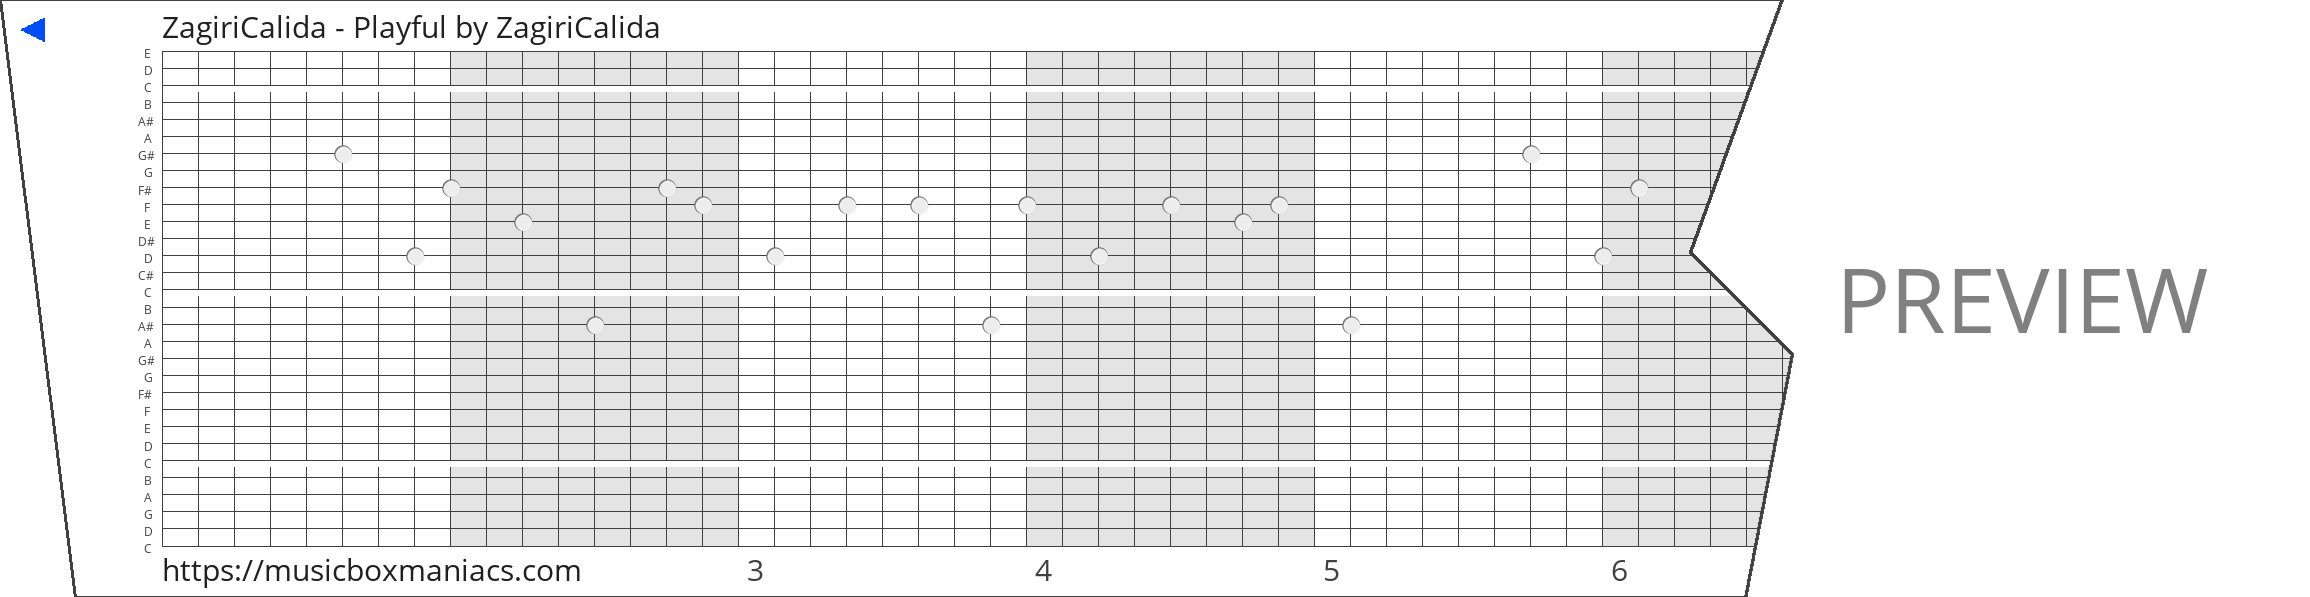 ZagiriCalida - Playful 30 note music box paper strip